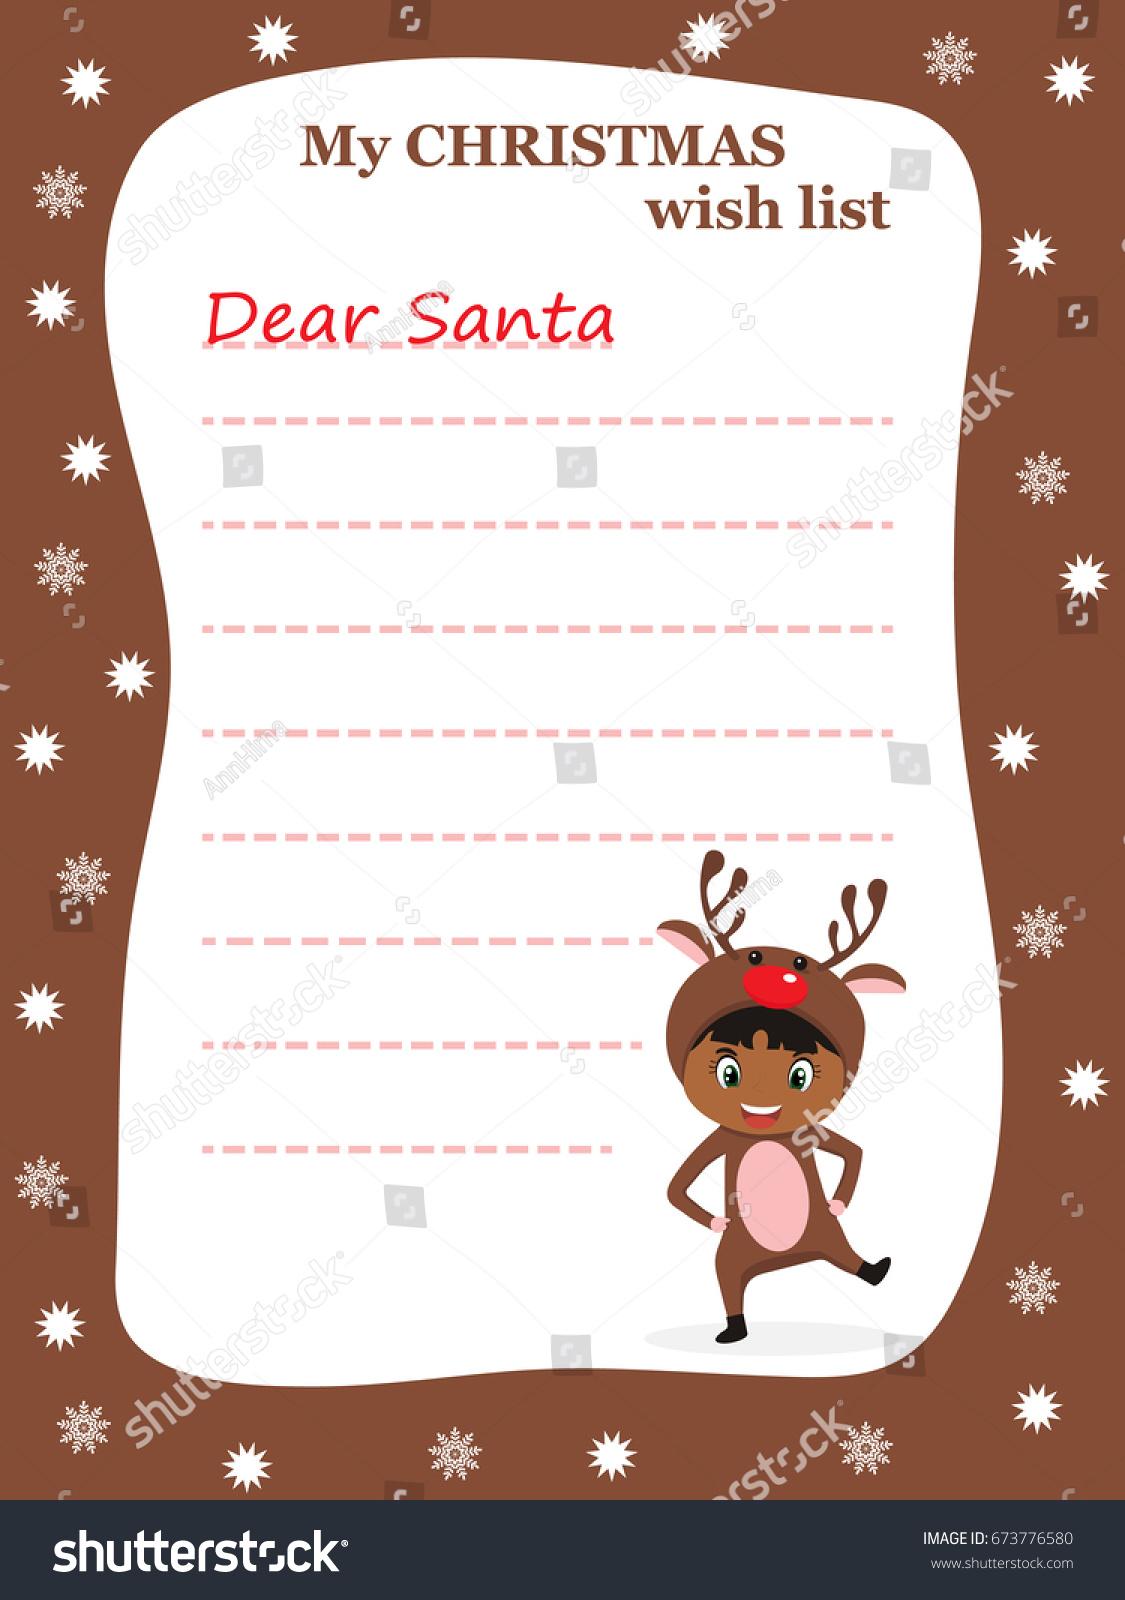 Dear Santa Letter Santa Claus Copyspace Stock Vector